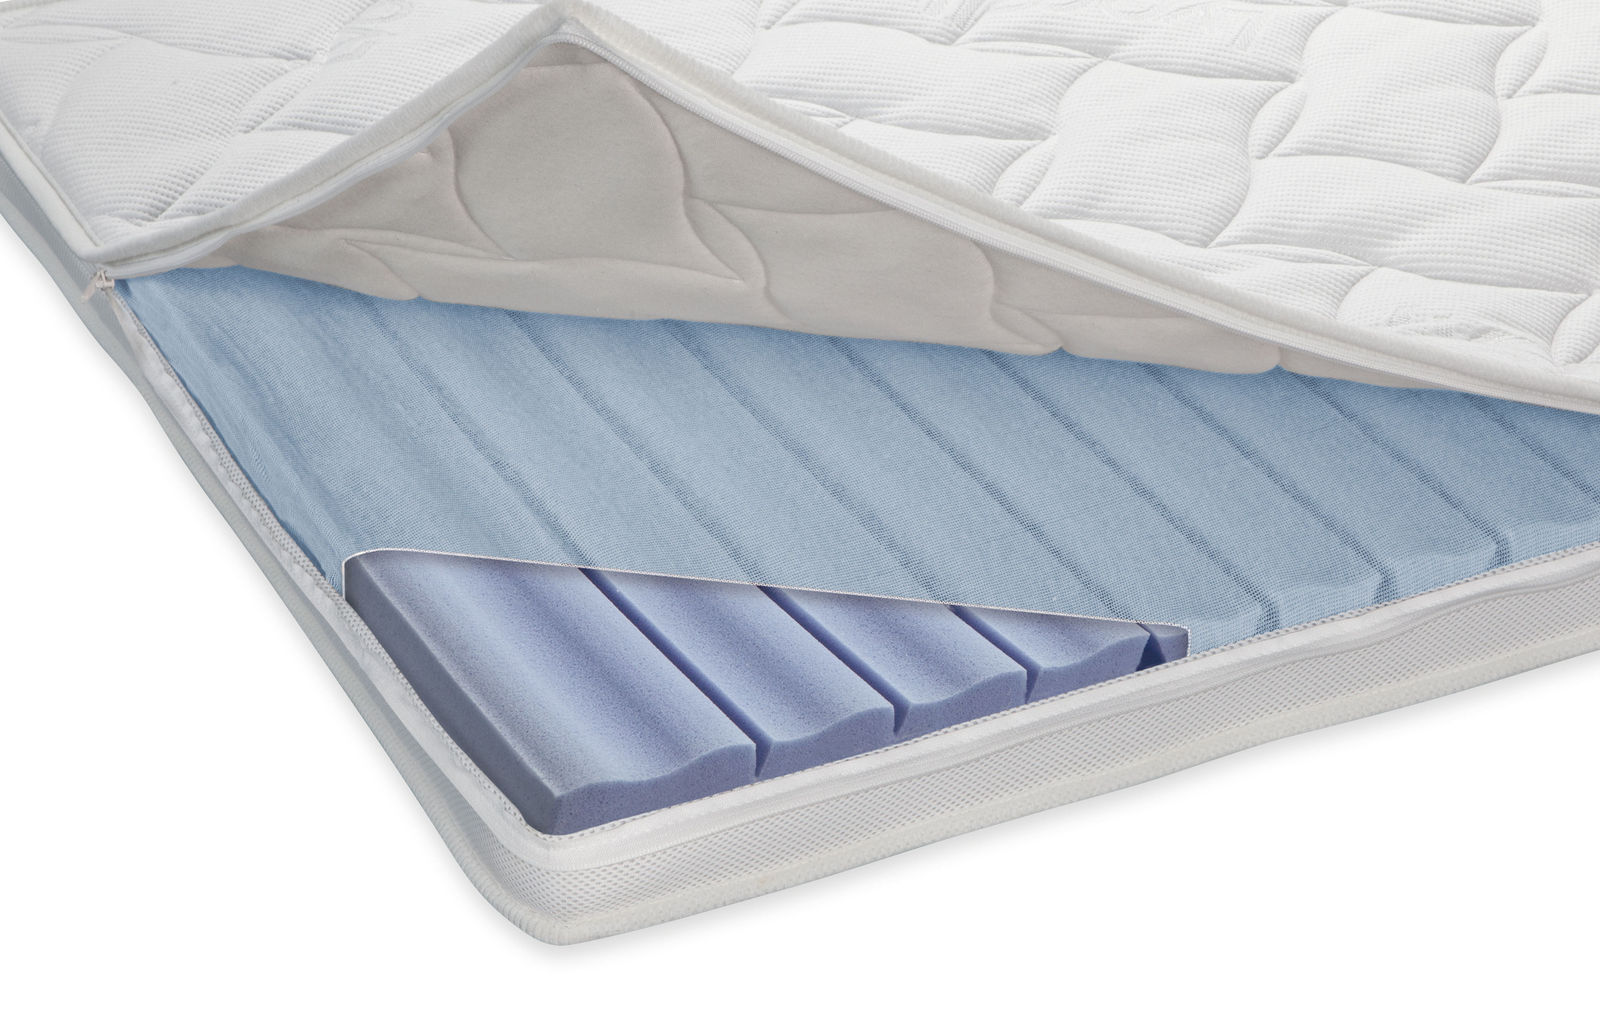 boxspringbett mit waschbarem matratzenbezug kunstleder tholen. Black Bedroom Furniture Sets. Home Design Ideas